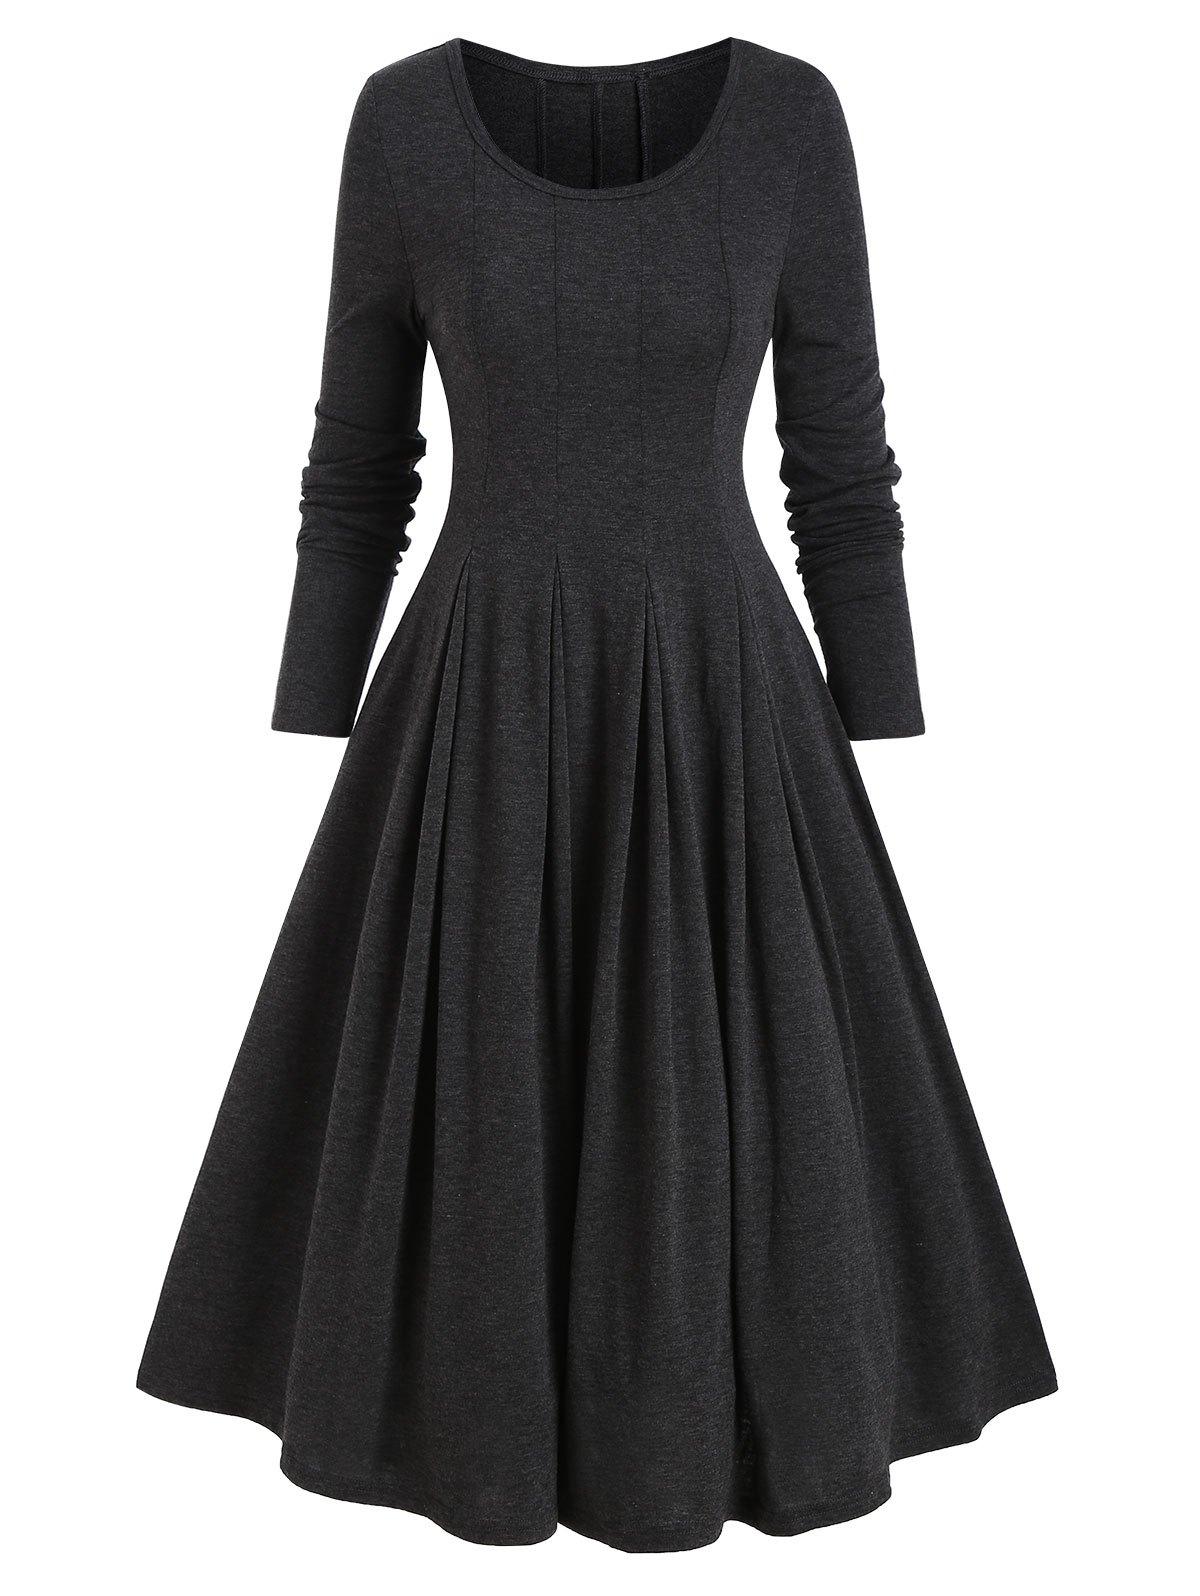 Long Sleeve Heathered Flare Dress